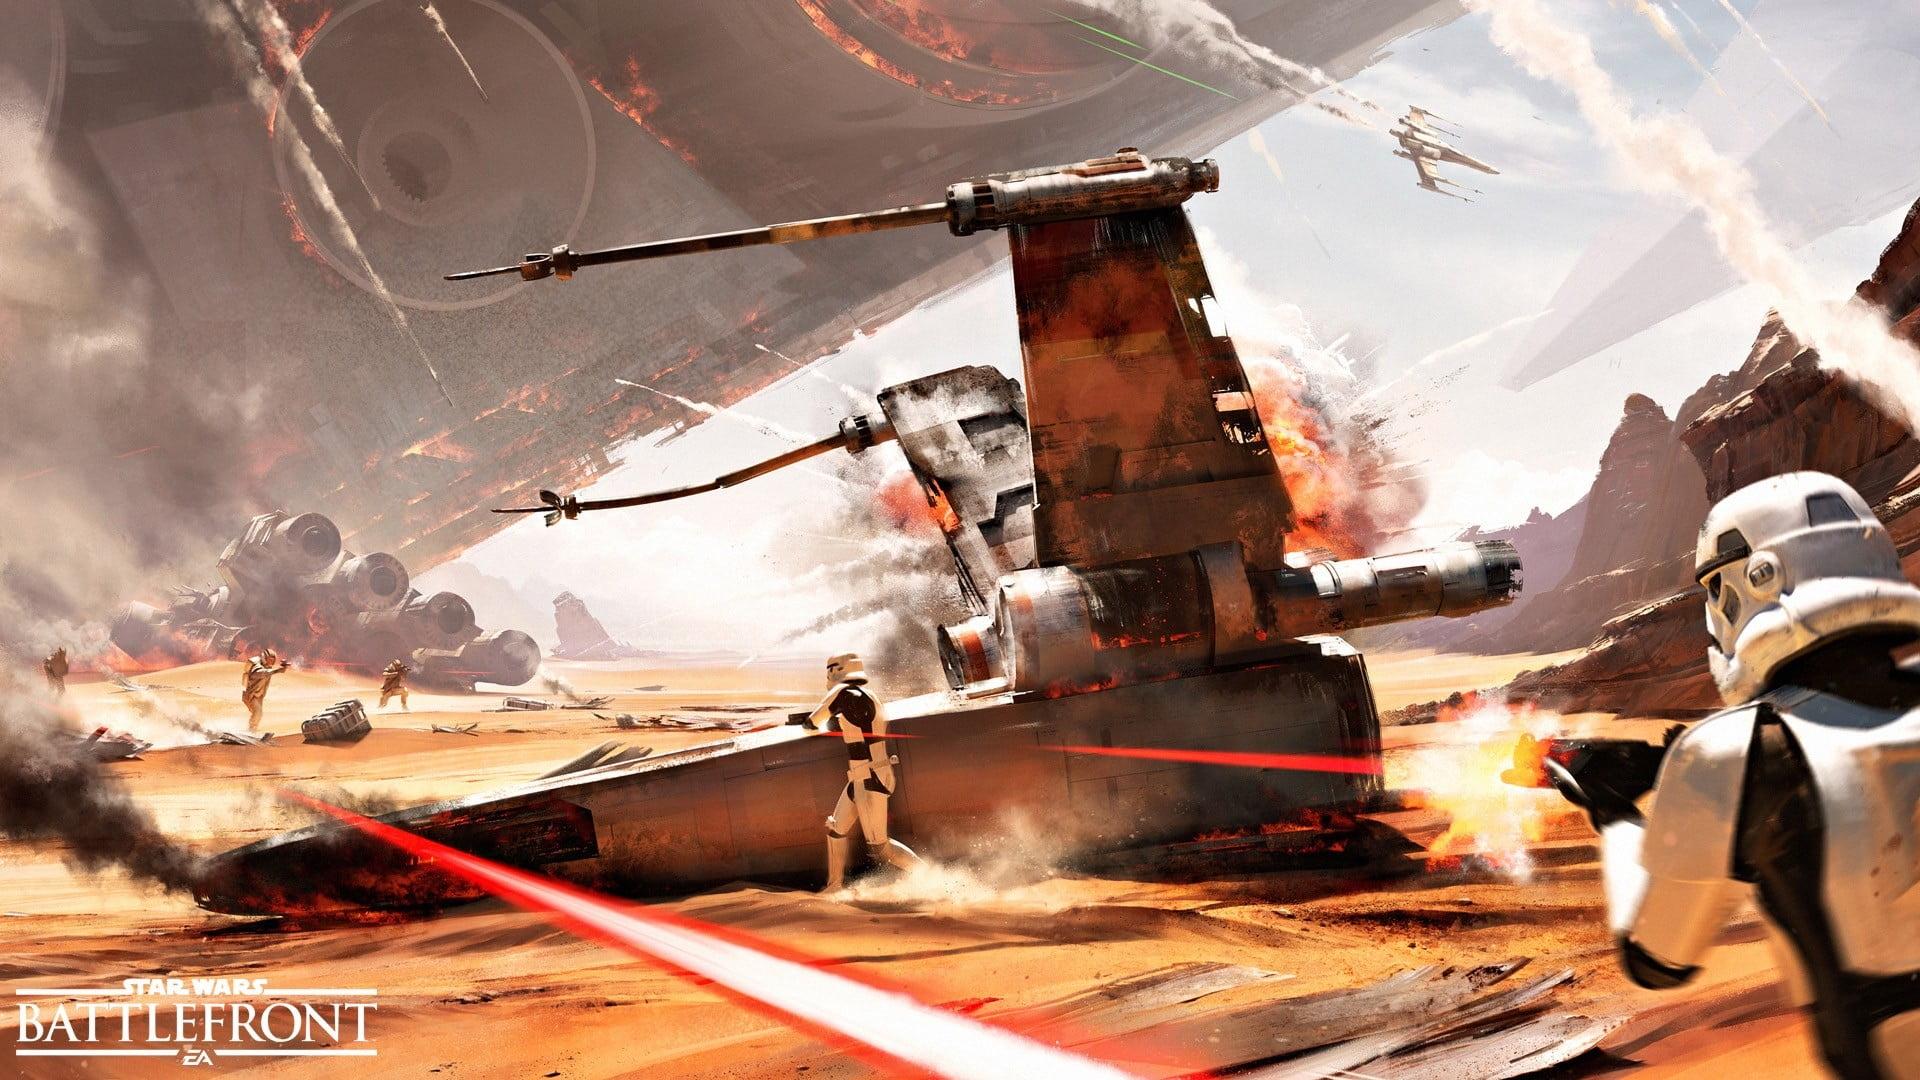 Star Wars Battlefront Wallpaper 1920x1080 Posted By Christopher Walker